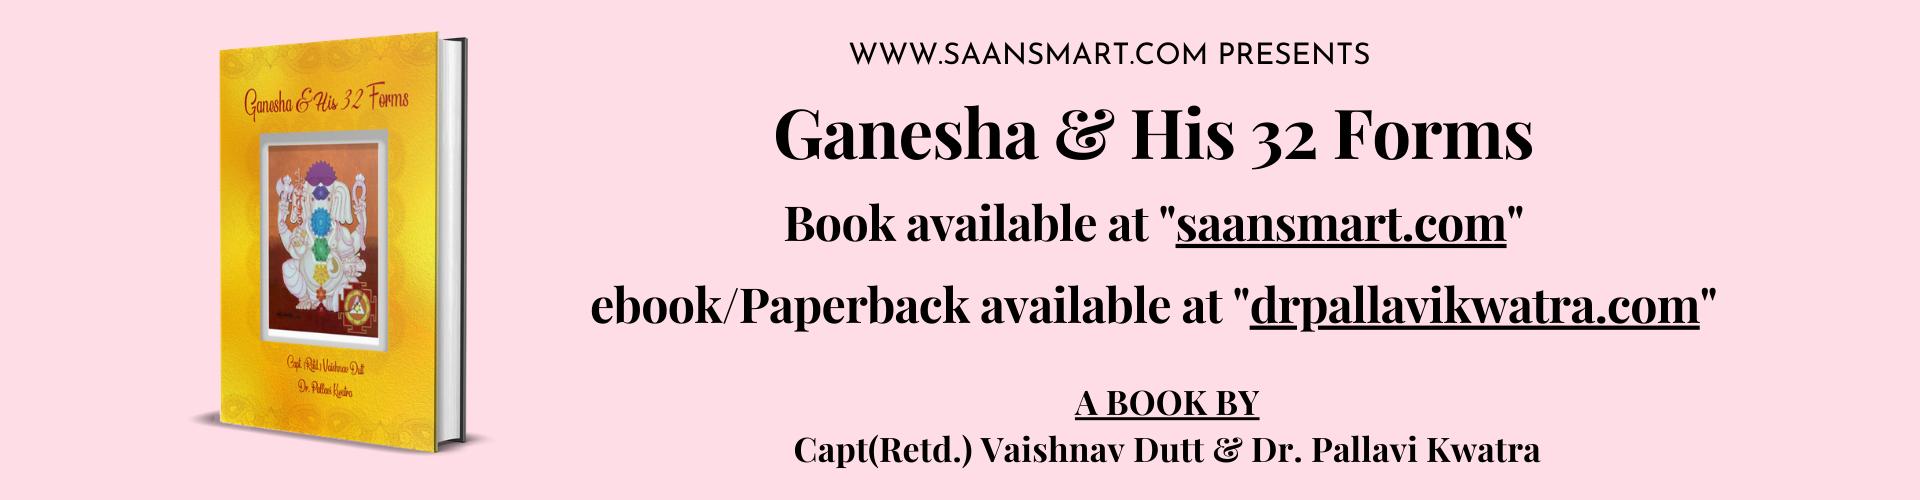 Ganesha His 32 Forms7 1